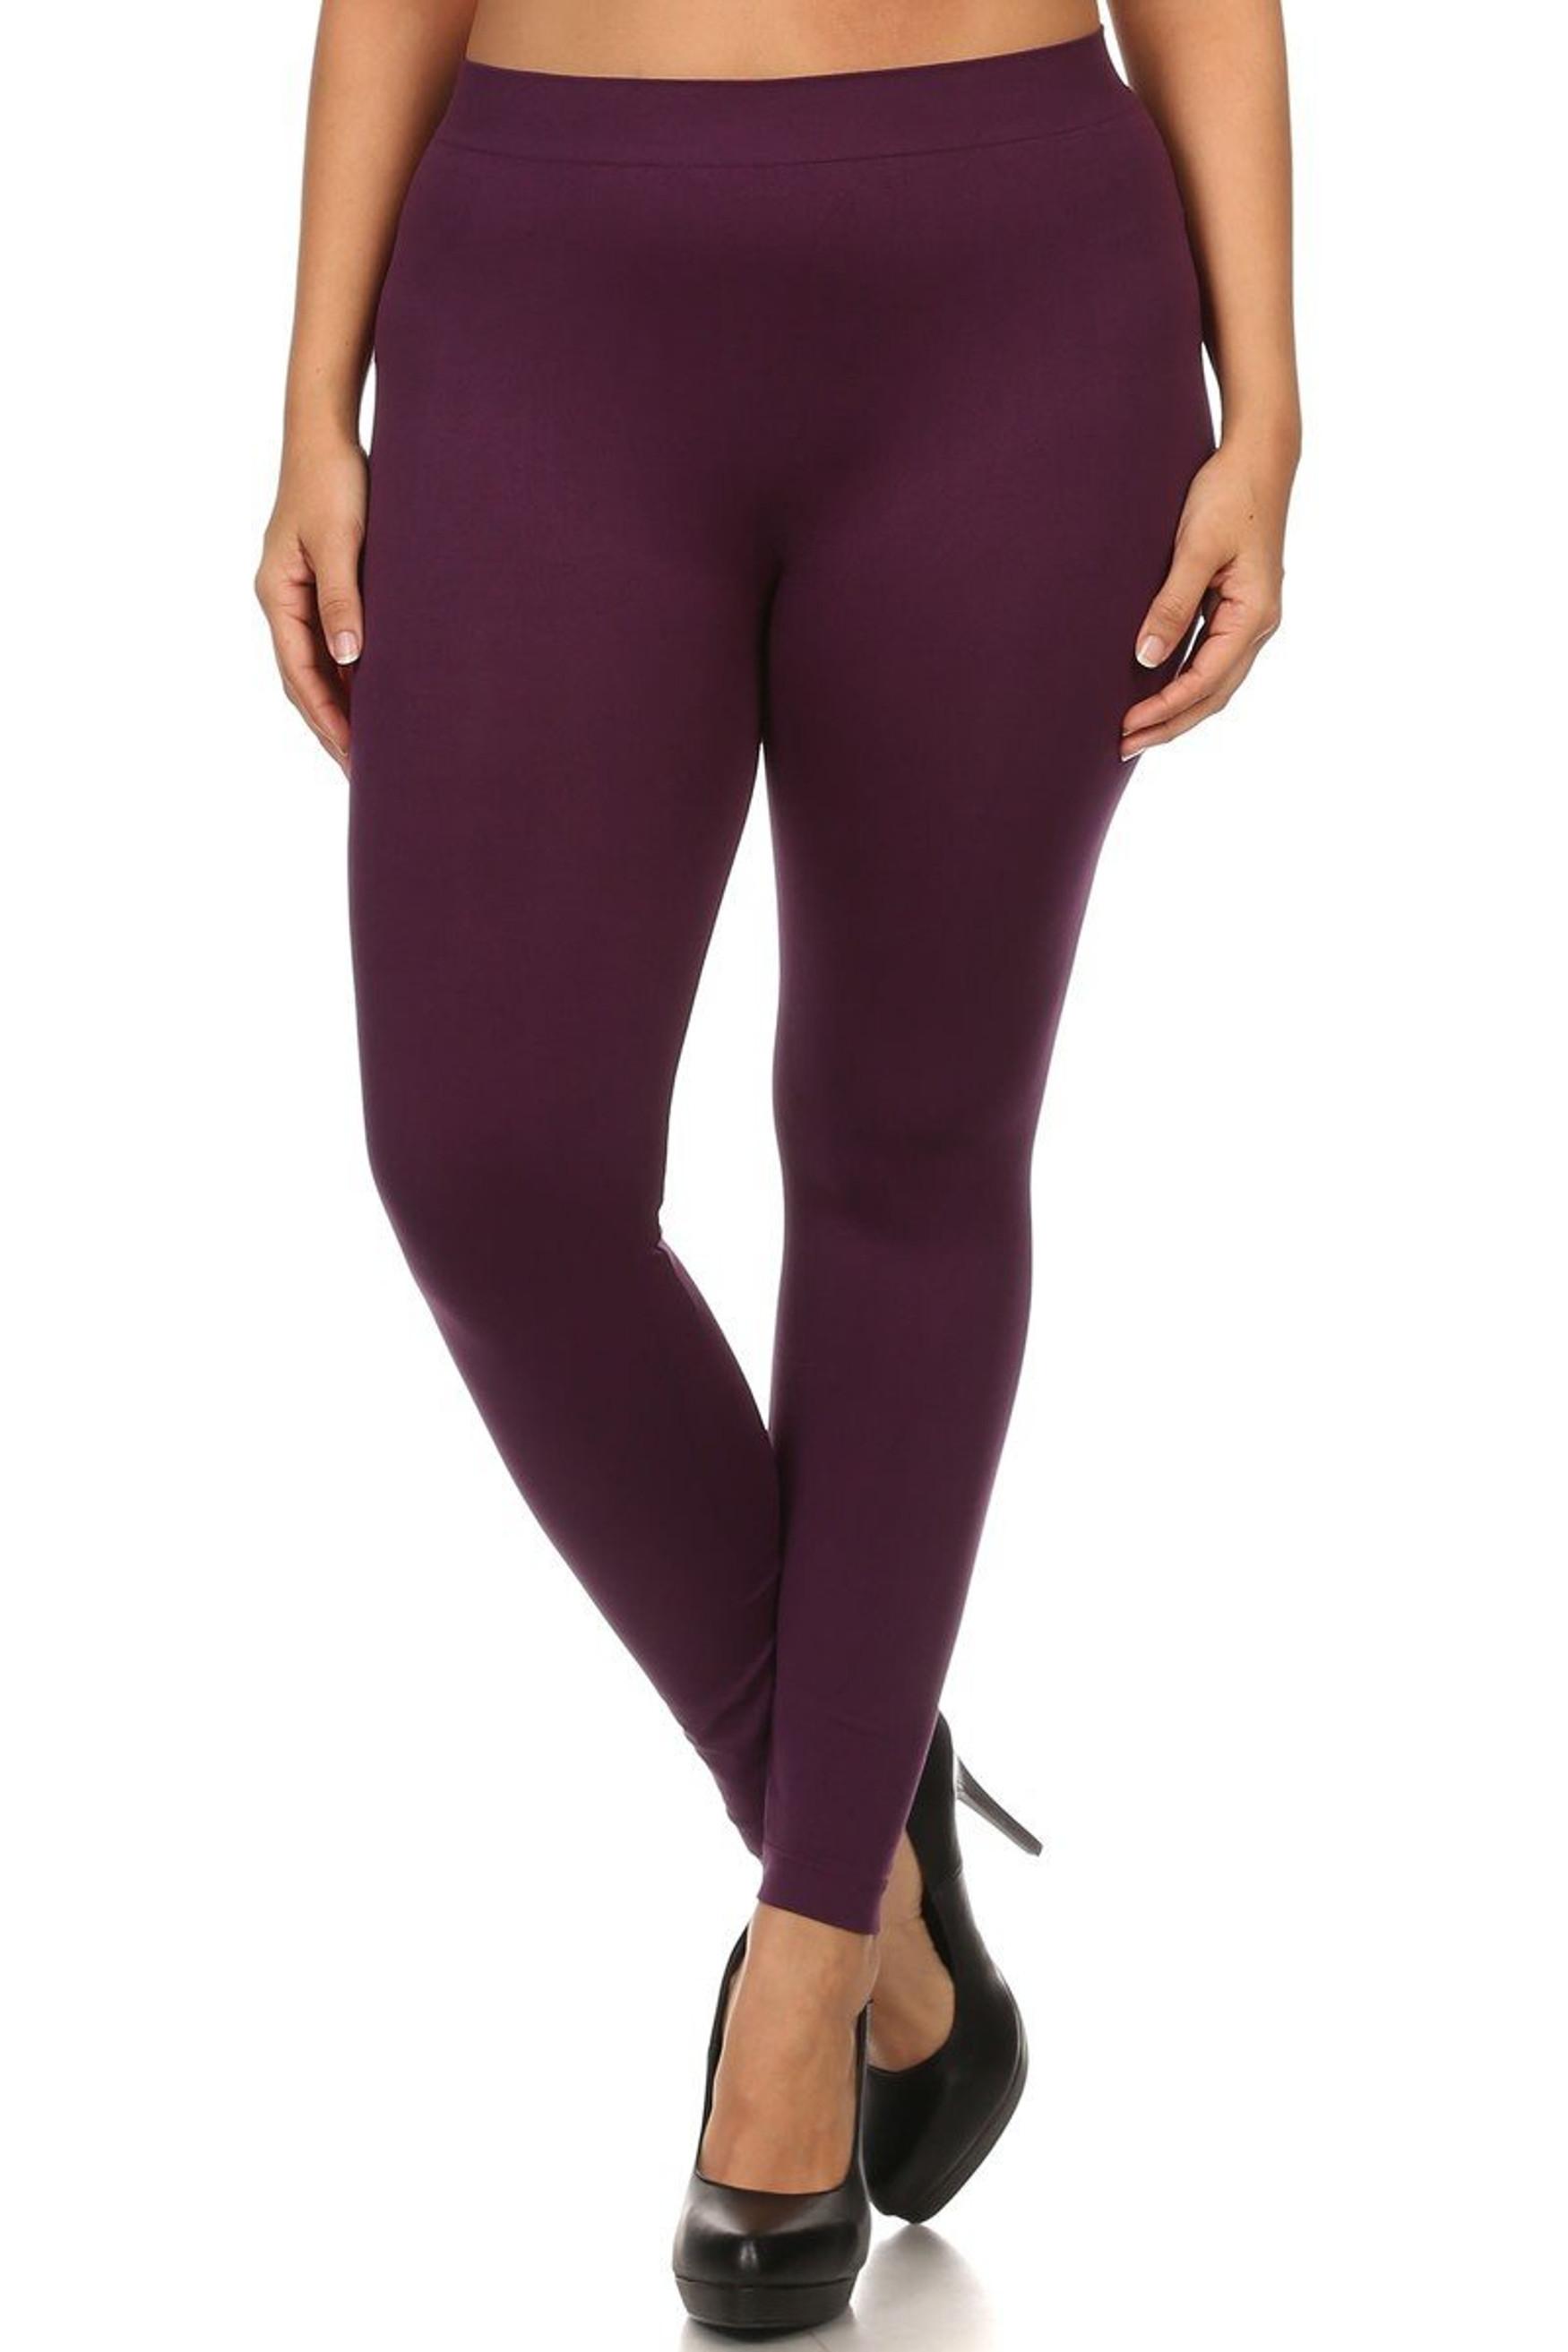 Purple Full Length Nylon Spandex Leggings - Plus Size